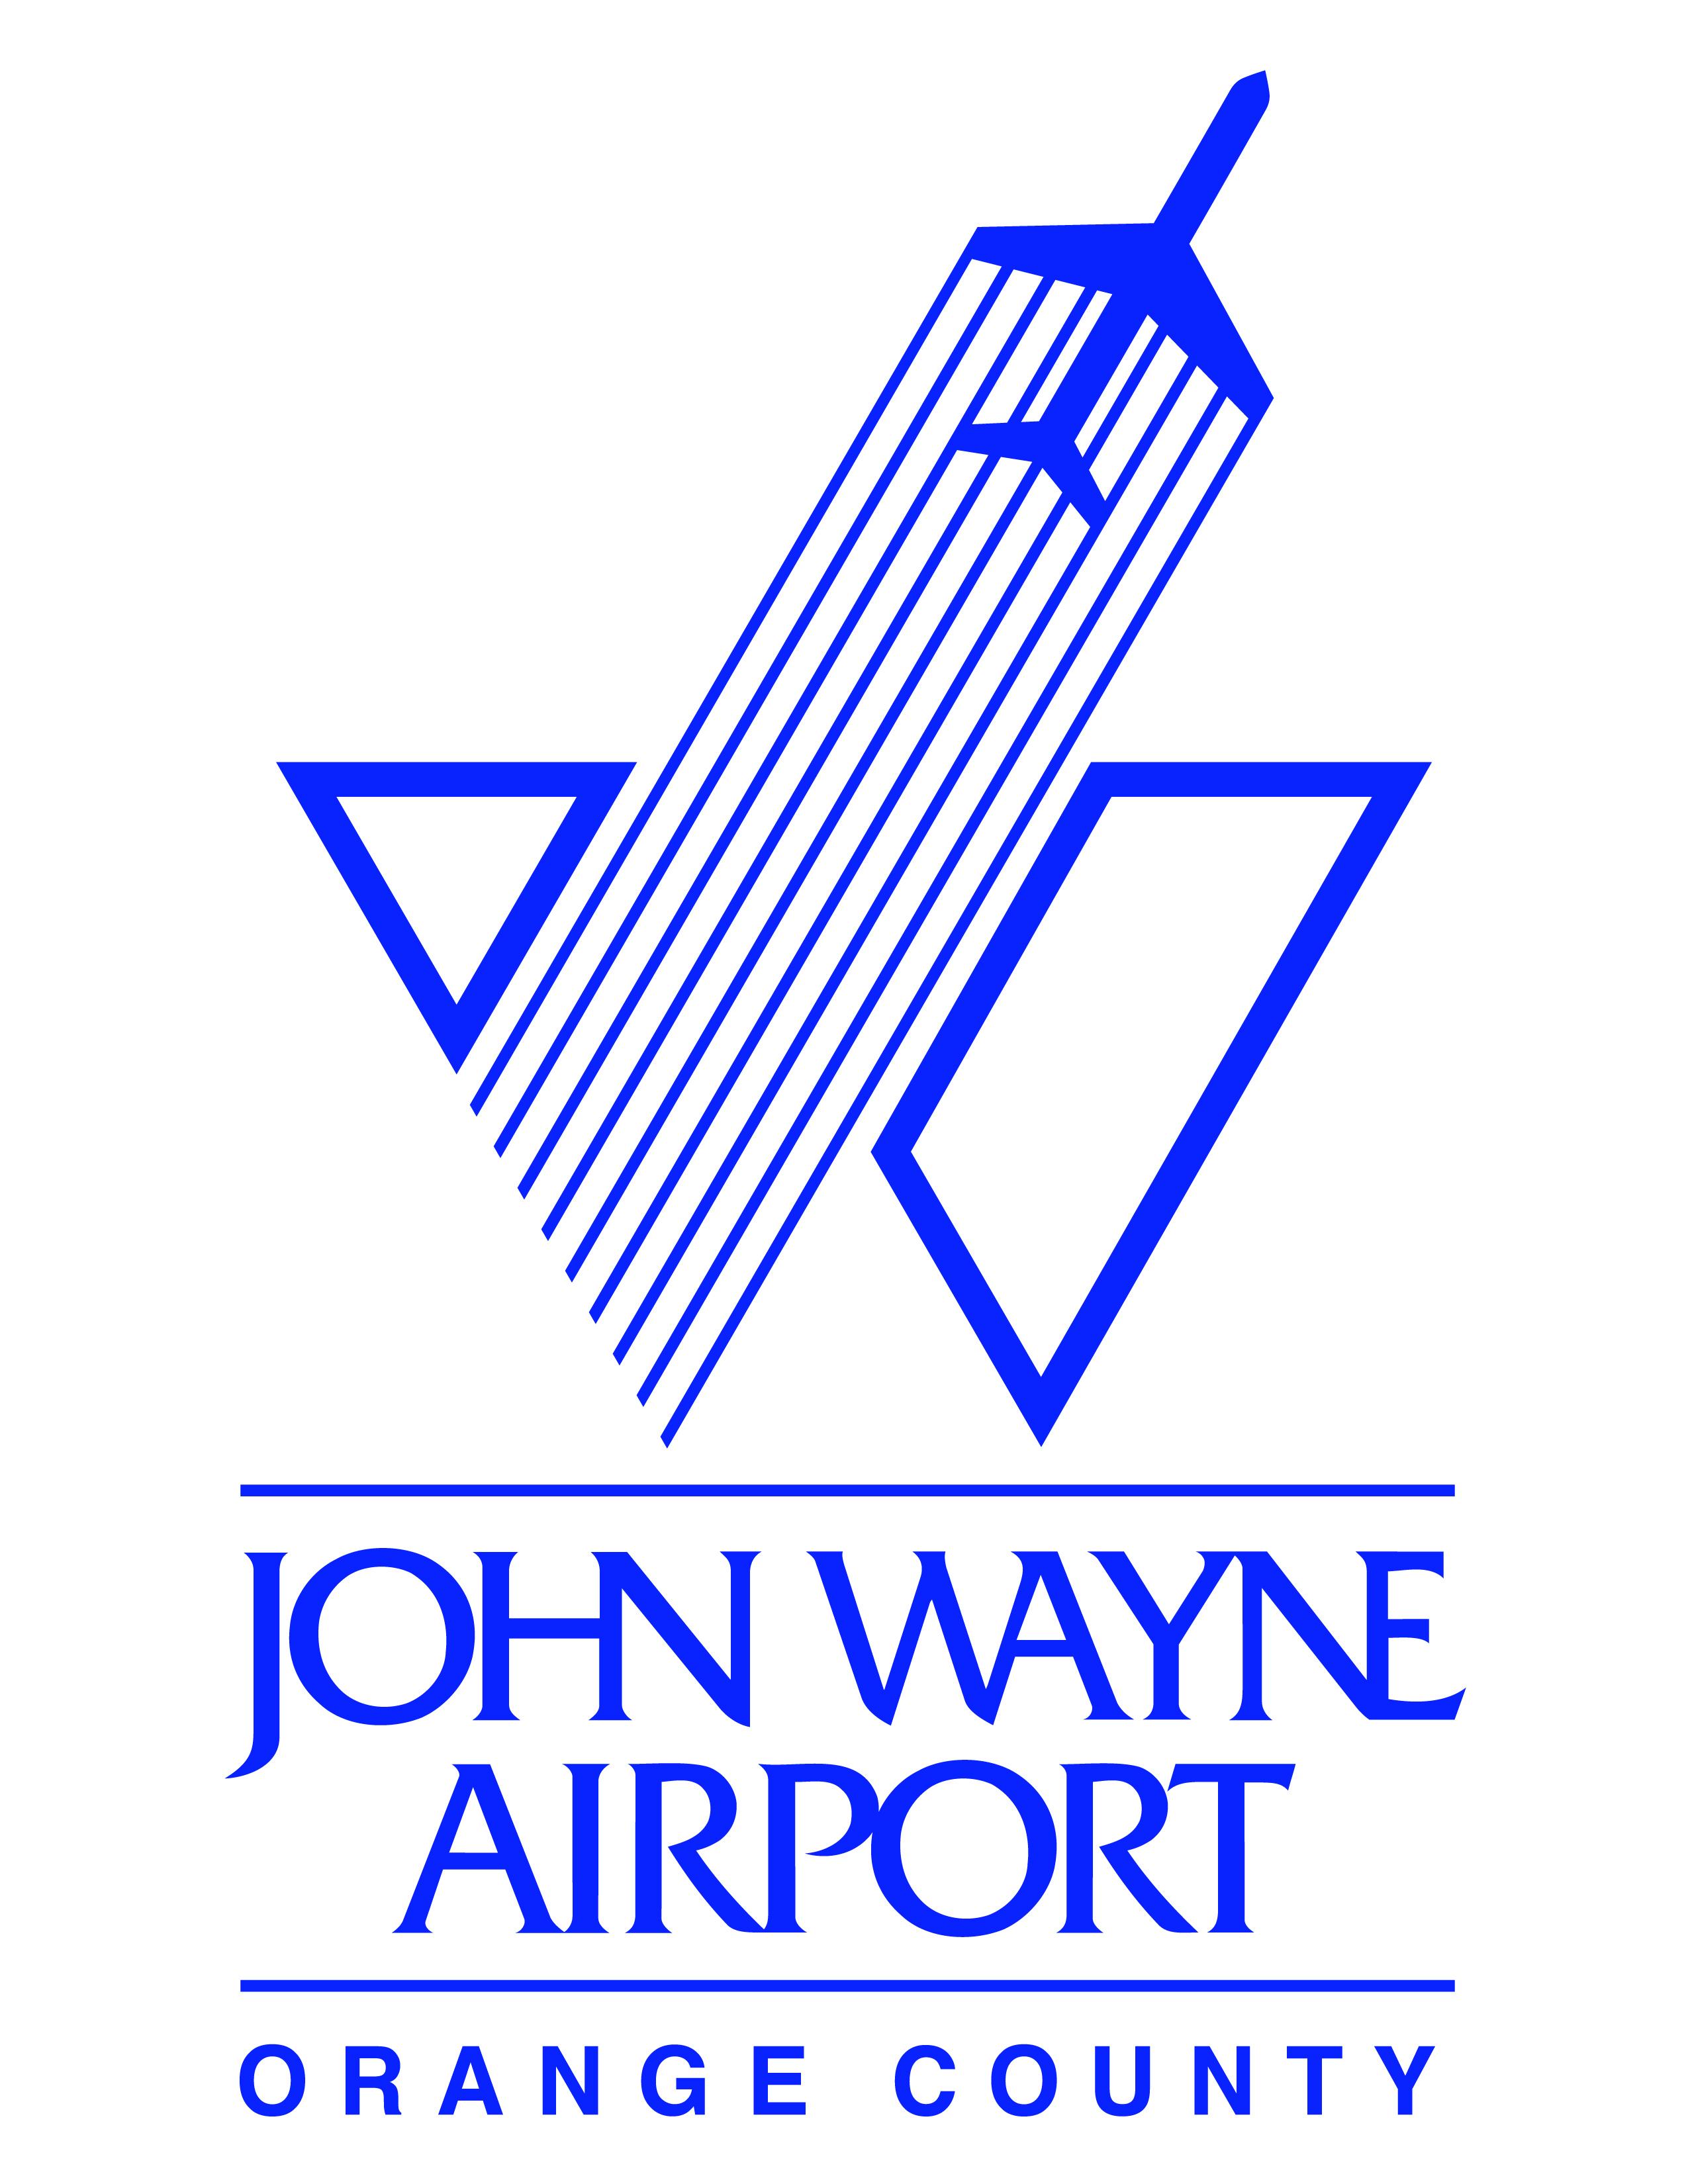 John Wayne Airport Orange County